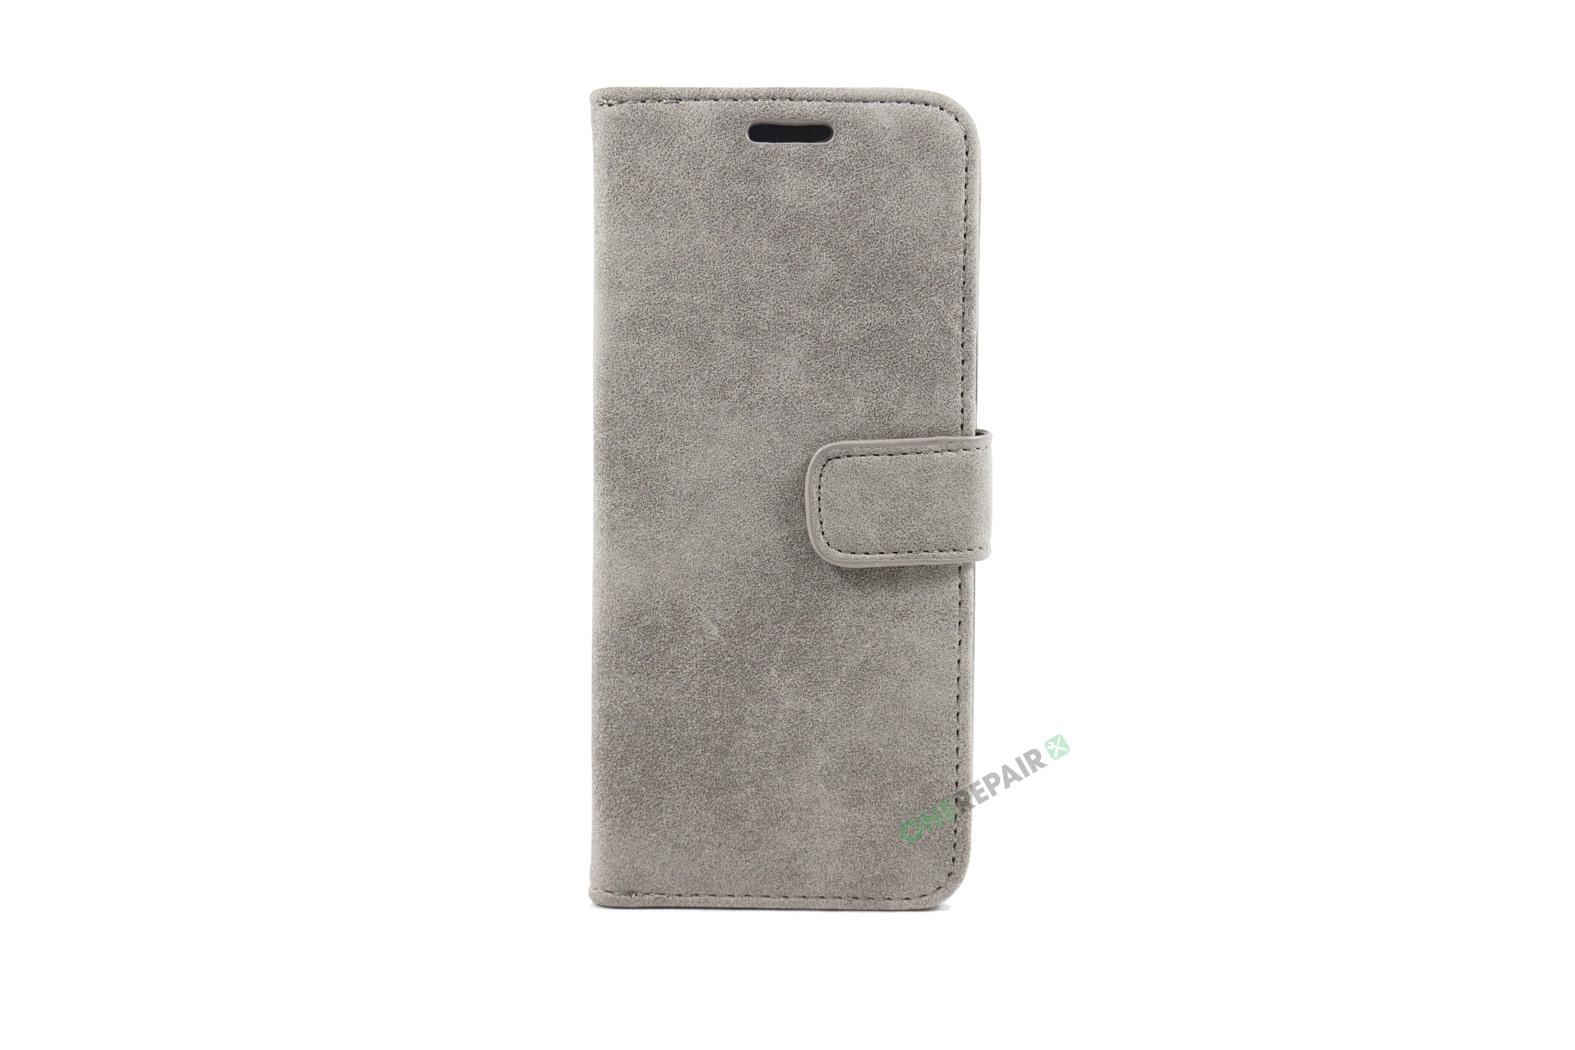 350698_Samsung_S8+_Flipcover_Rustik_Cover_Graa_OneRepair_00001